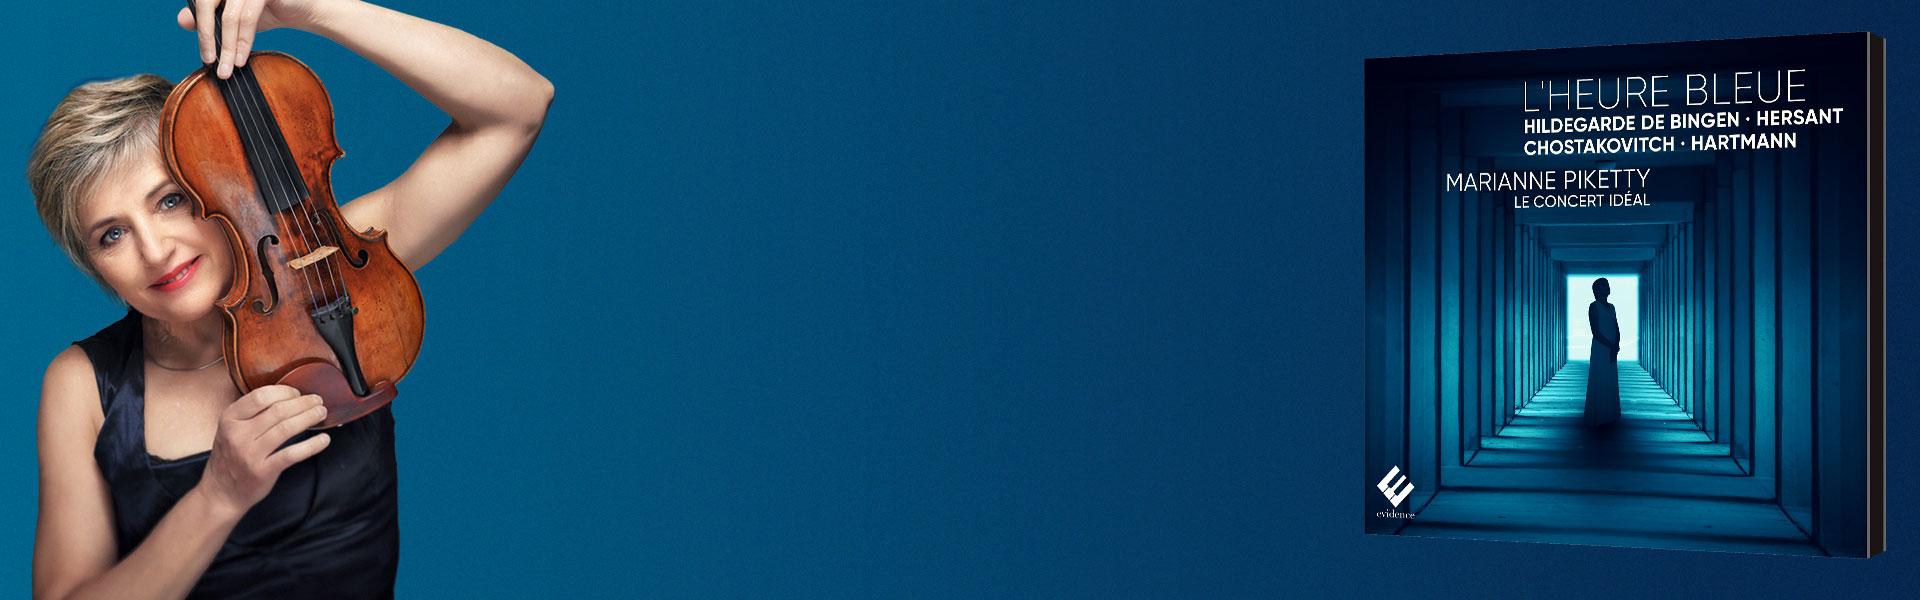 Marianne Piketty, Le Concert Idéal: Blue Hour